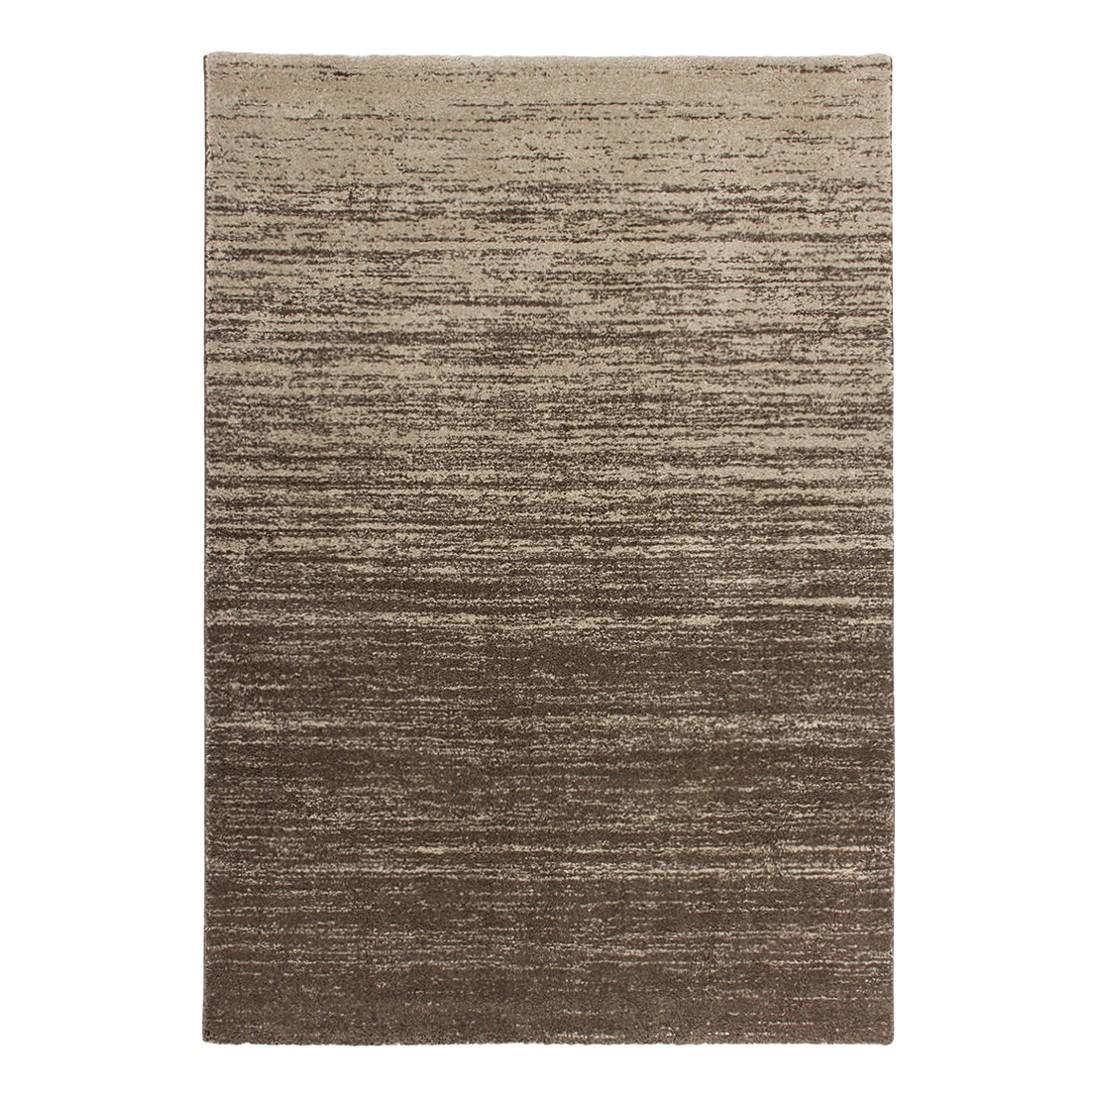 teppich kenya mombasa beige 80 x 150 cm kayoom g nstig bestellen. Black Bedroom Furniture Sets. Home Design Ideas